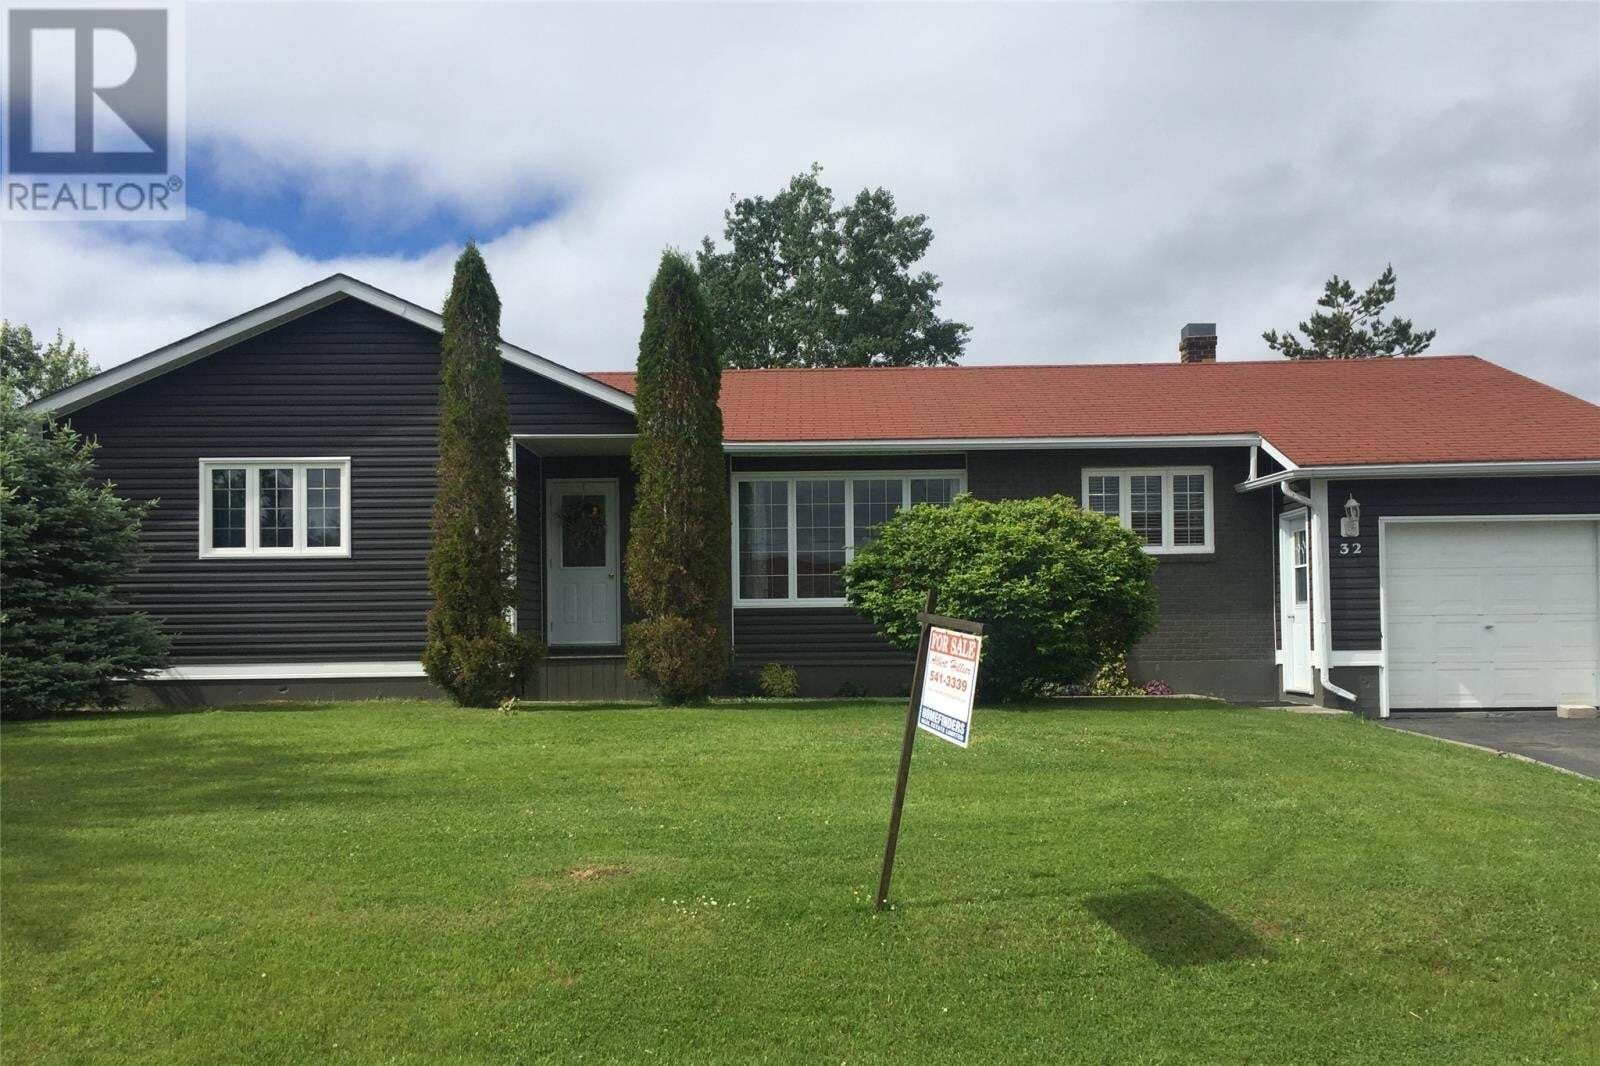 House for sale at 32 Birch St Lewisporte Newfoundland - MLS: 1214247